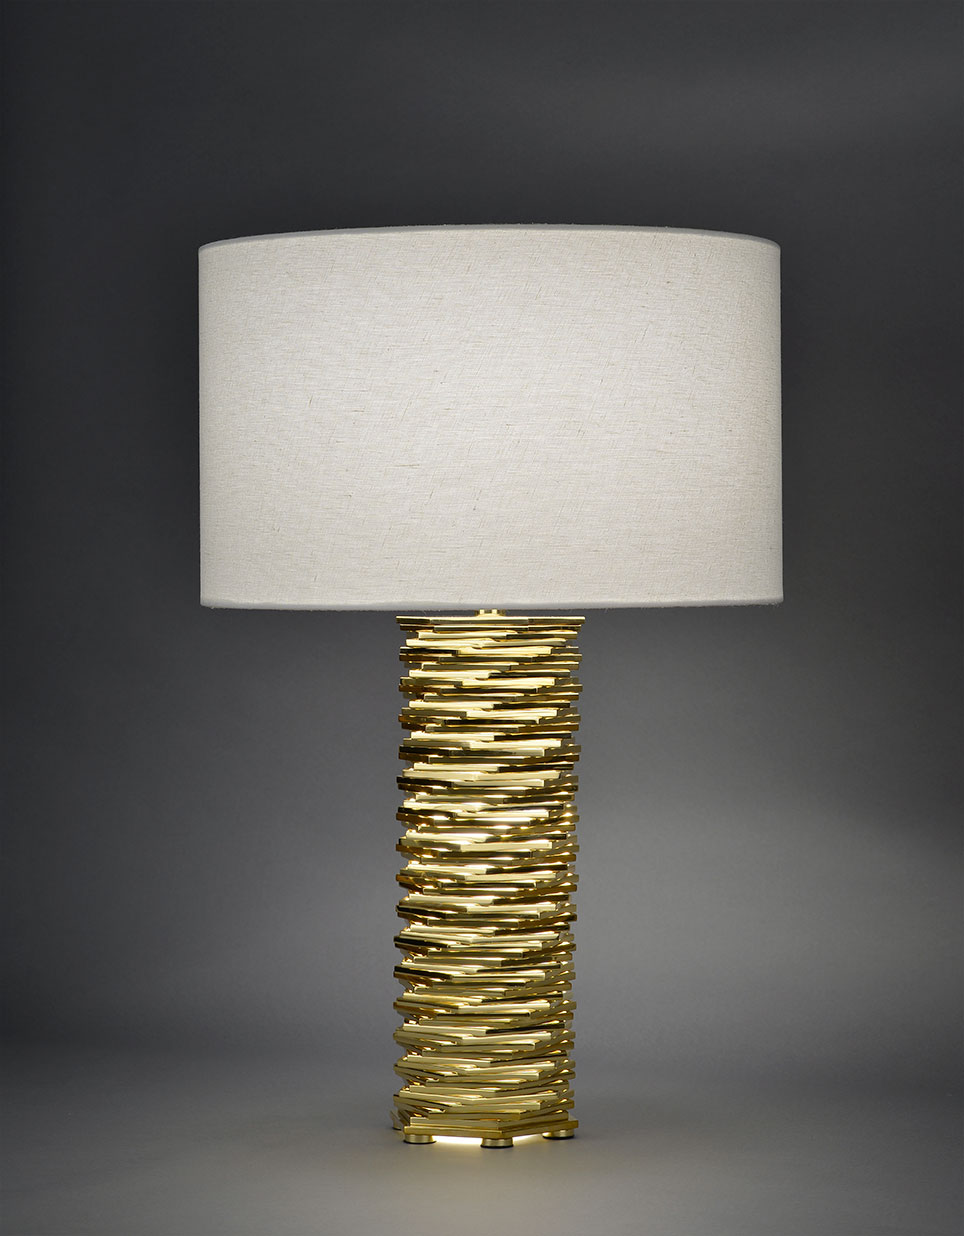 Solas Table Lamp